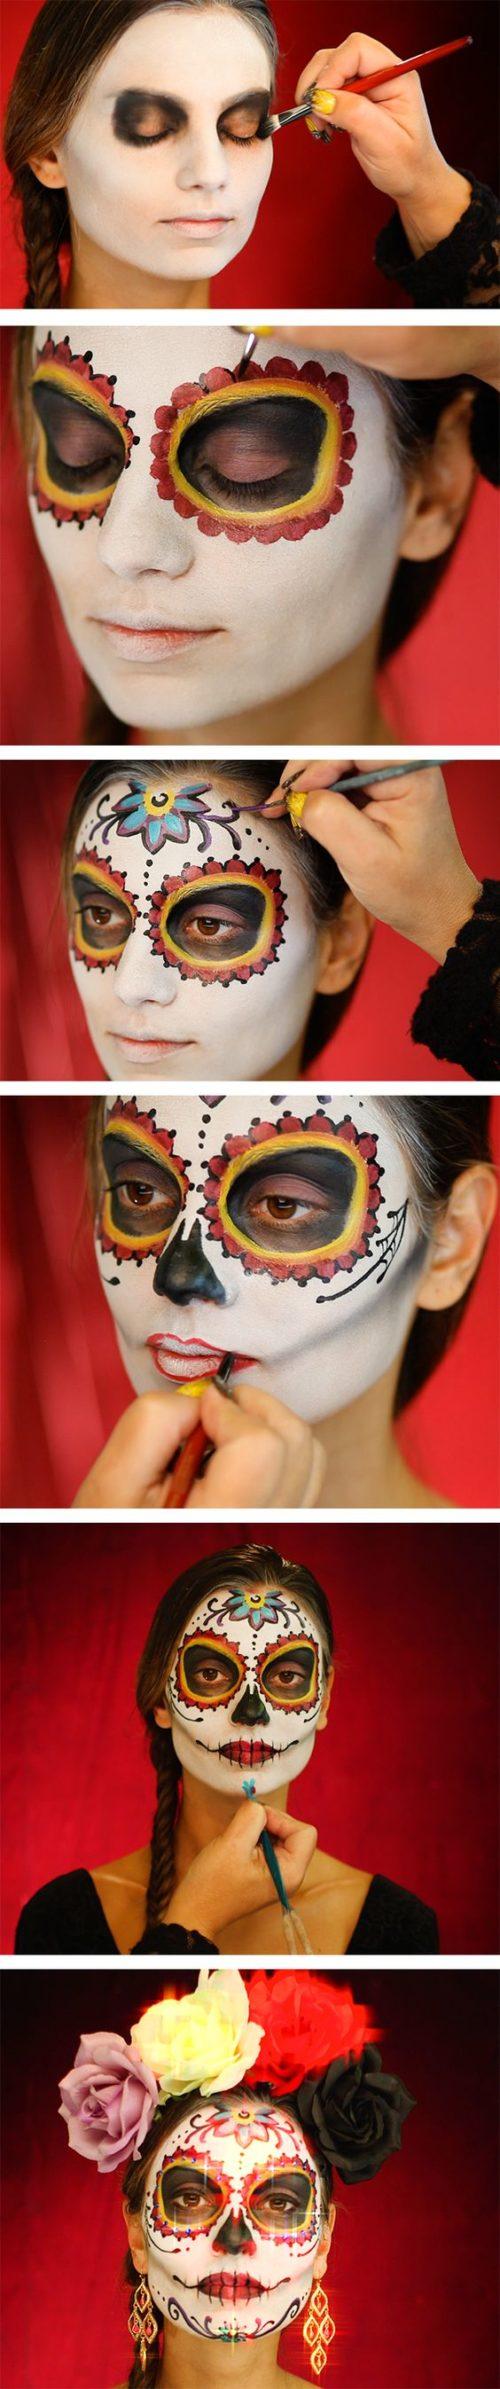 maquillajes-de-catrinas-8